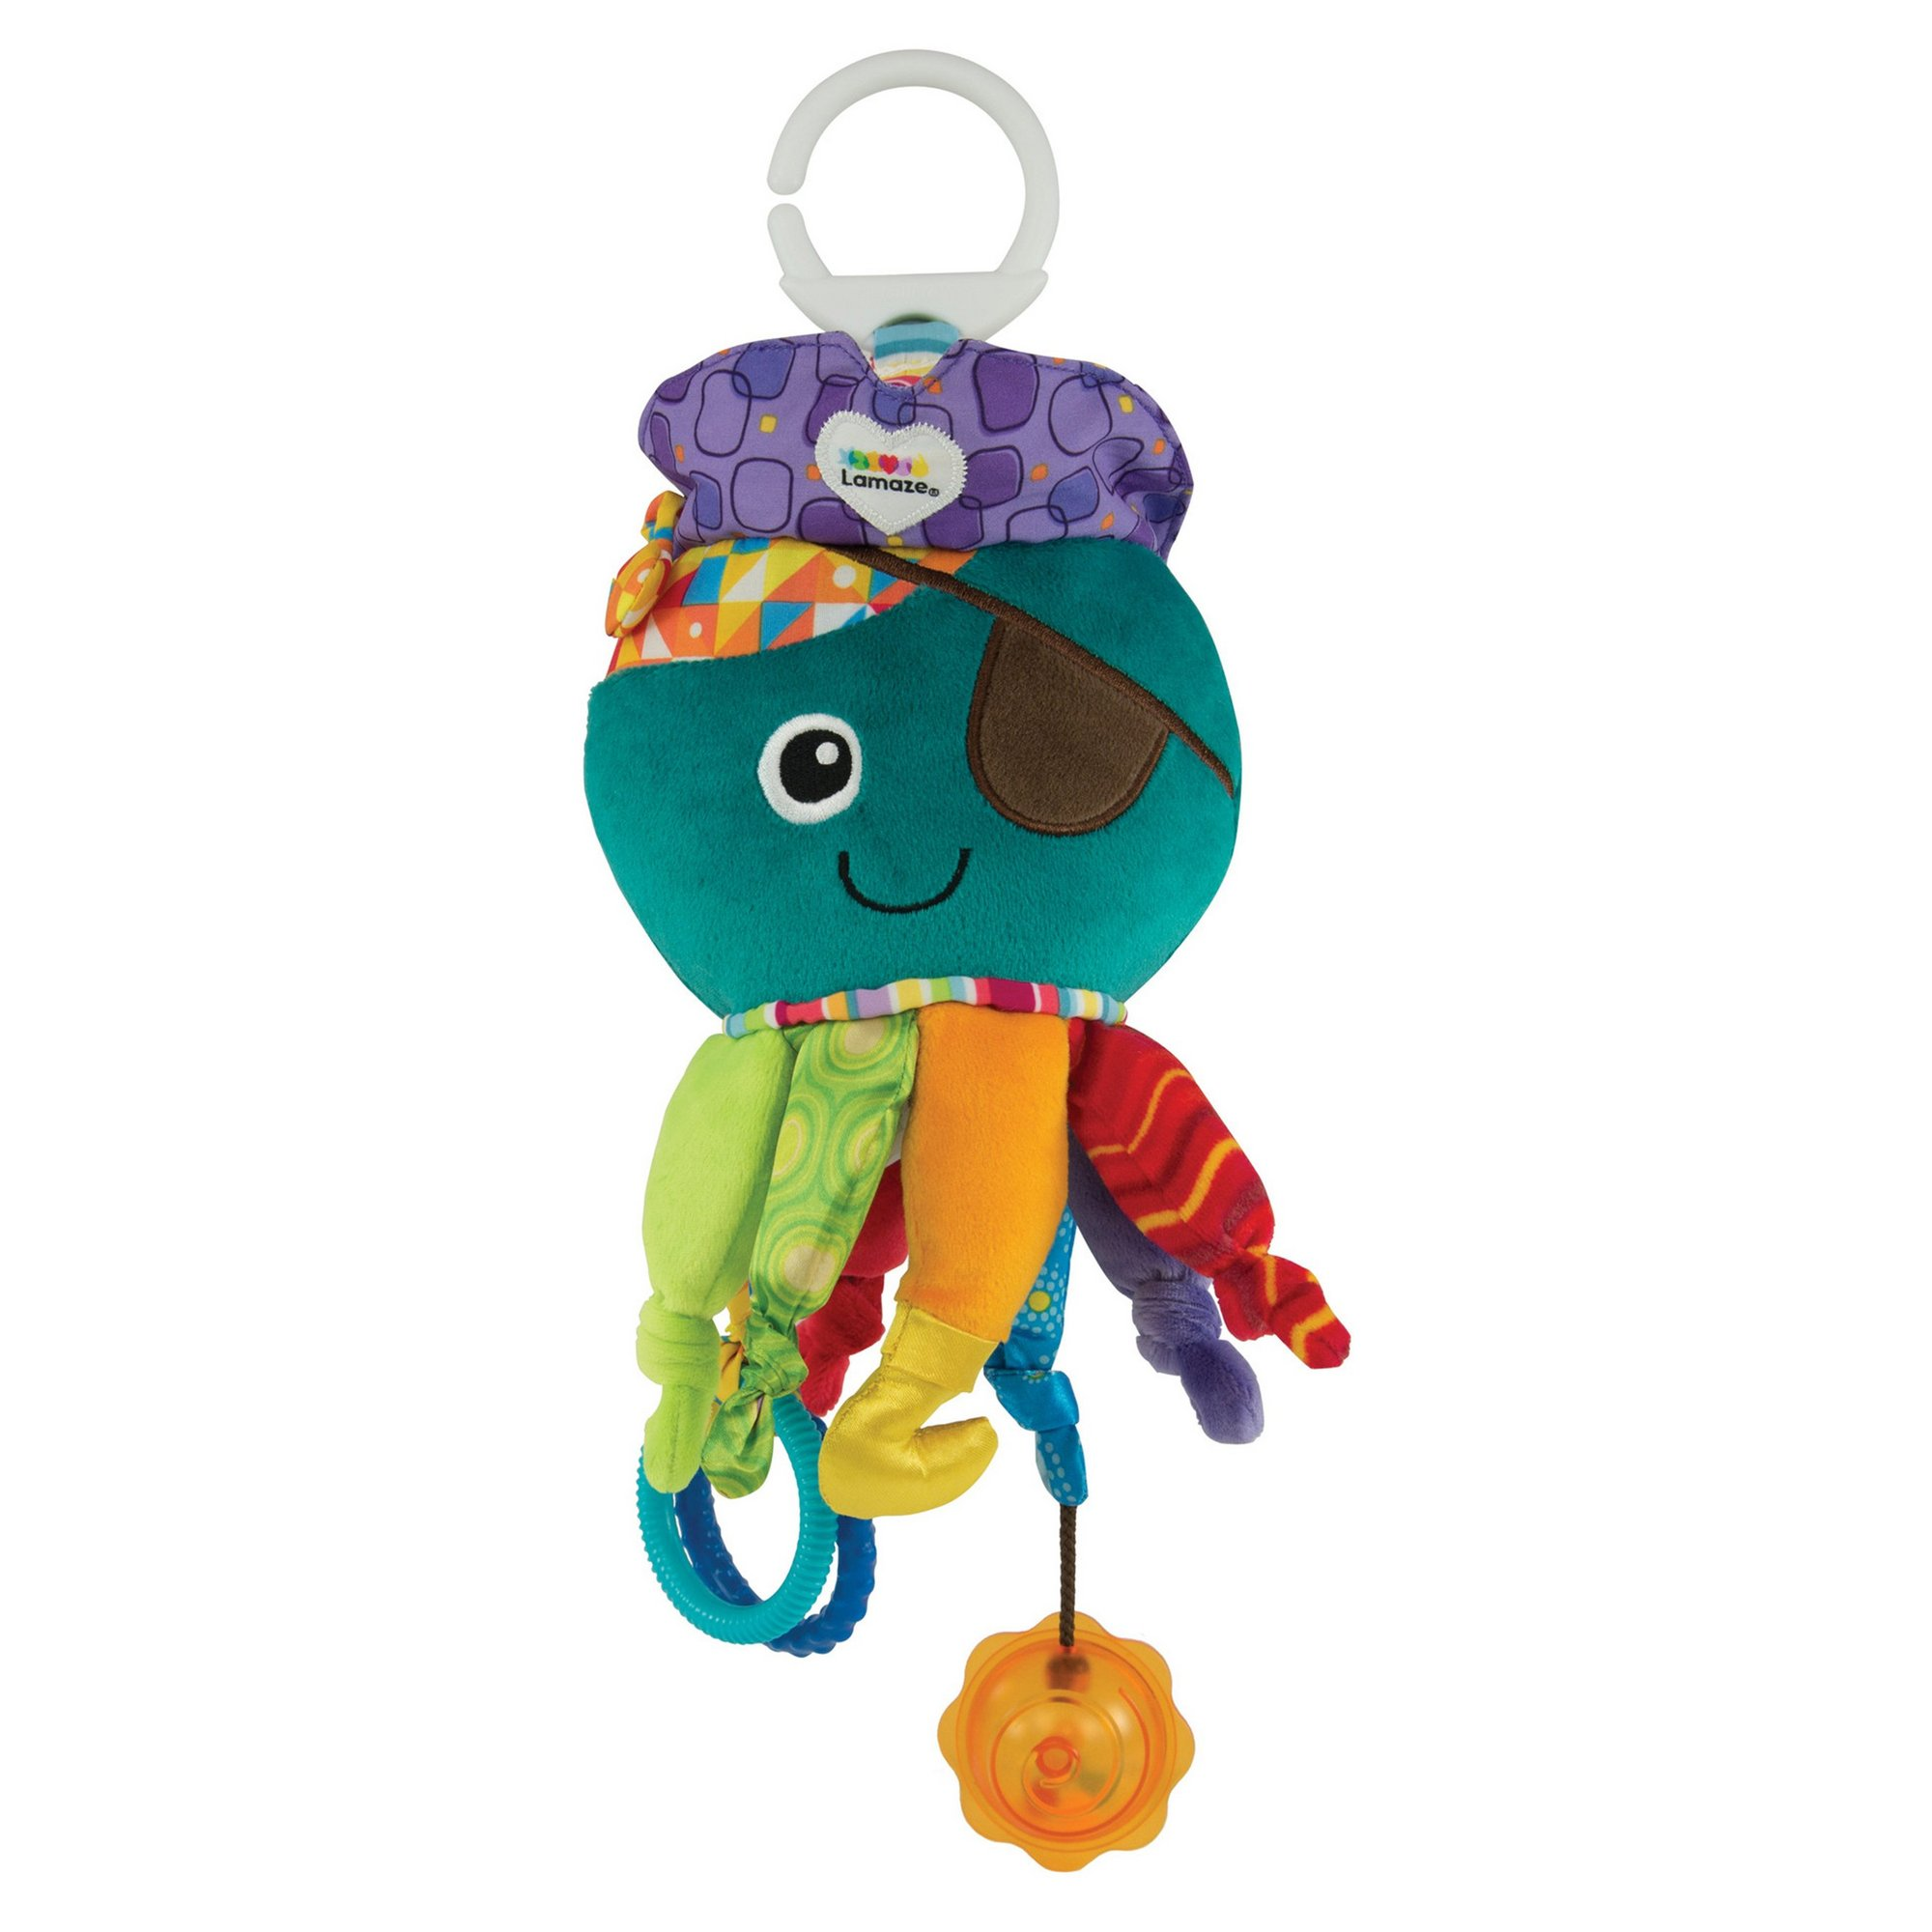 Image of Lamaze P and G Captain Calamari the Octopus Pirate